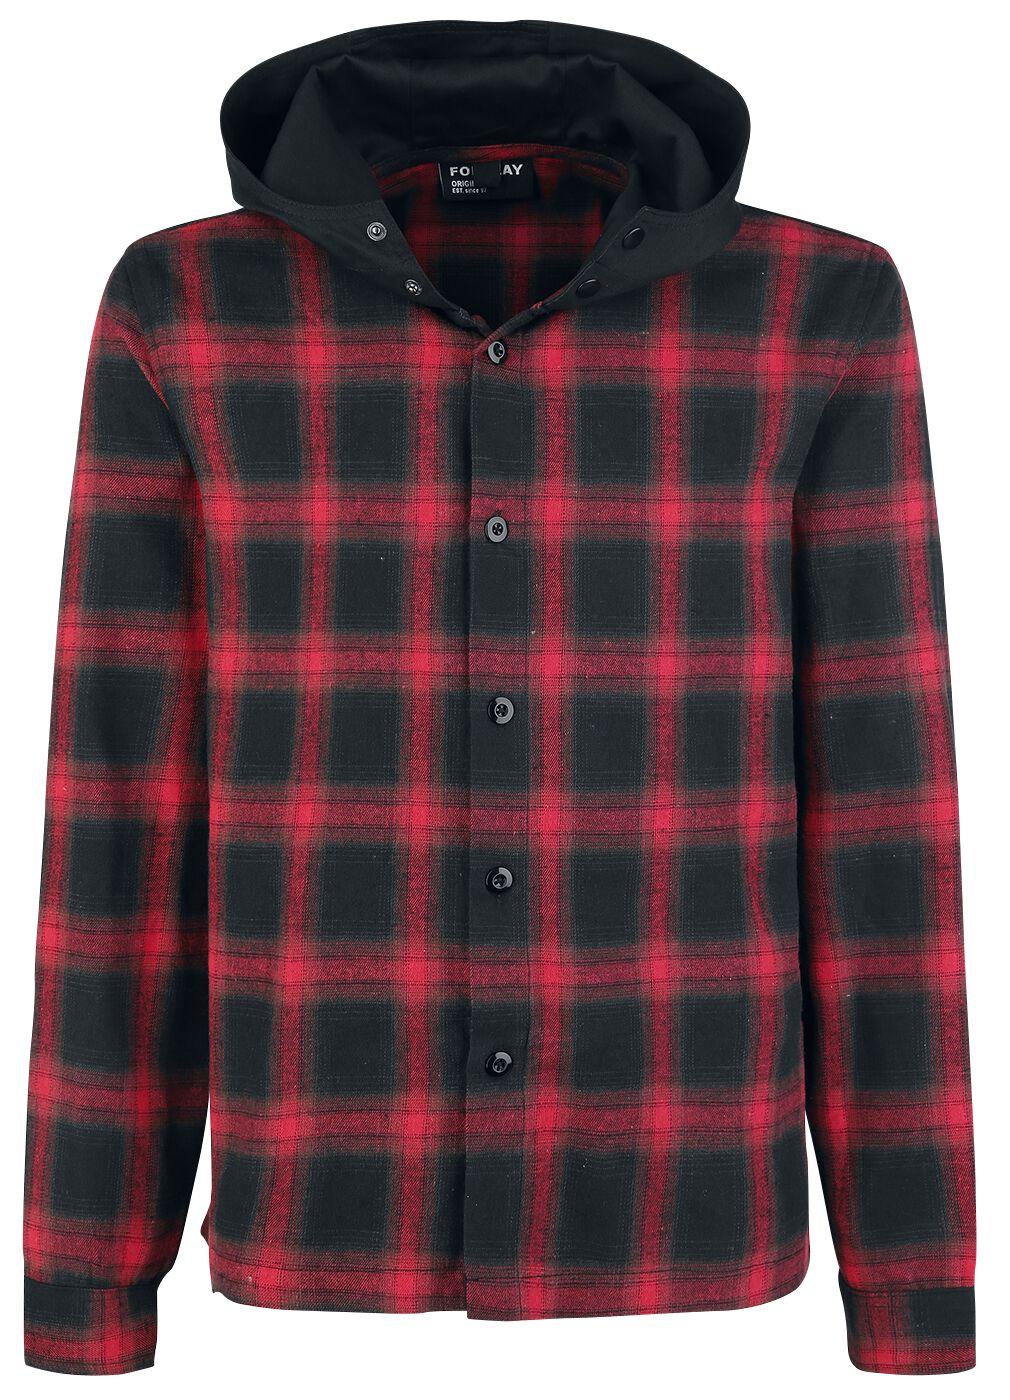 Image of   Forplay Hooded Checked Flanel Shirt Skjorte sort-rød